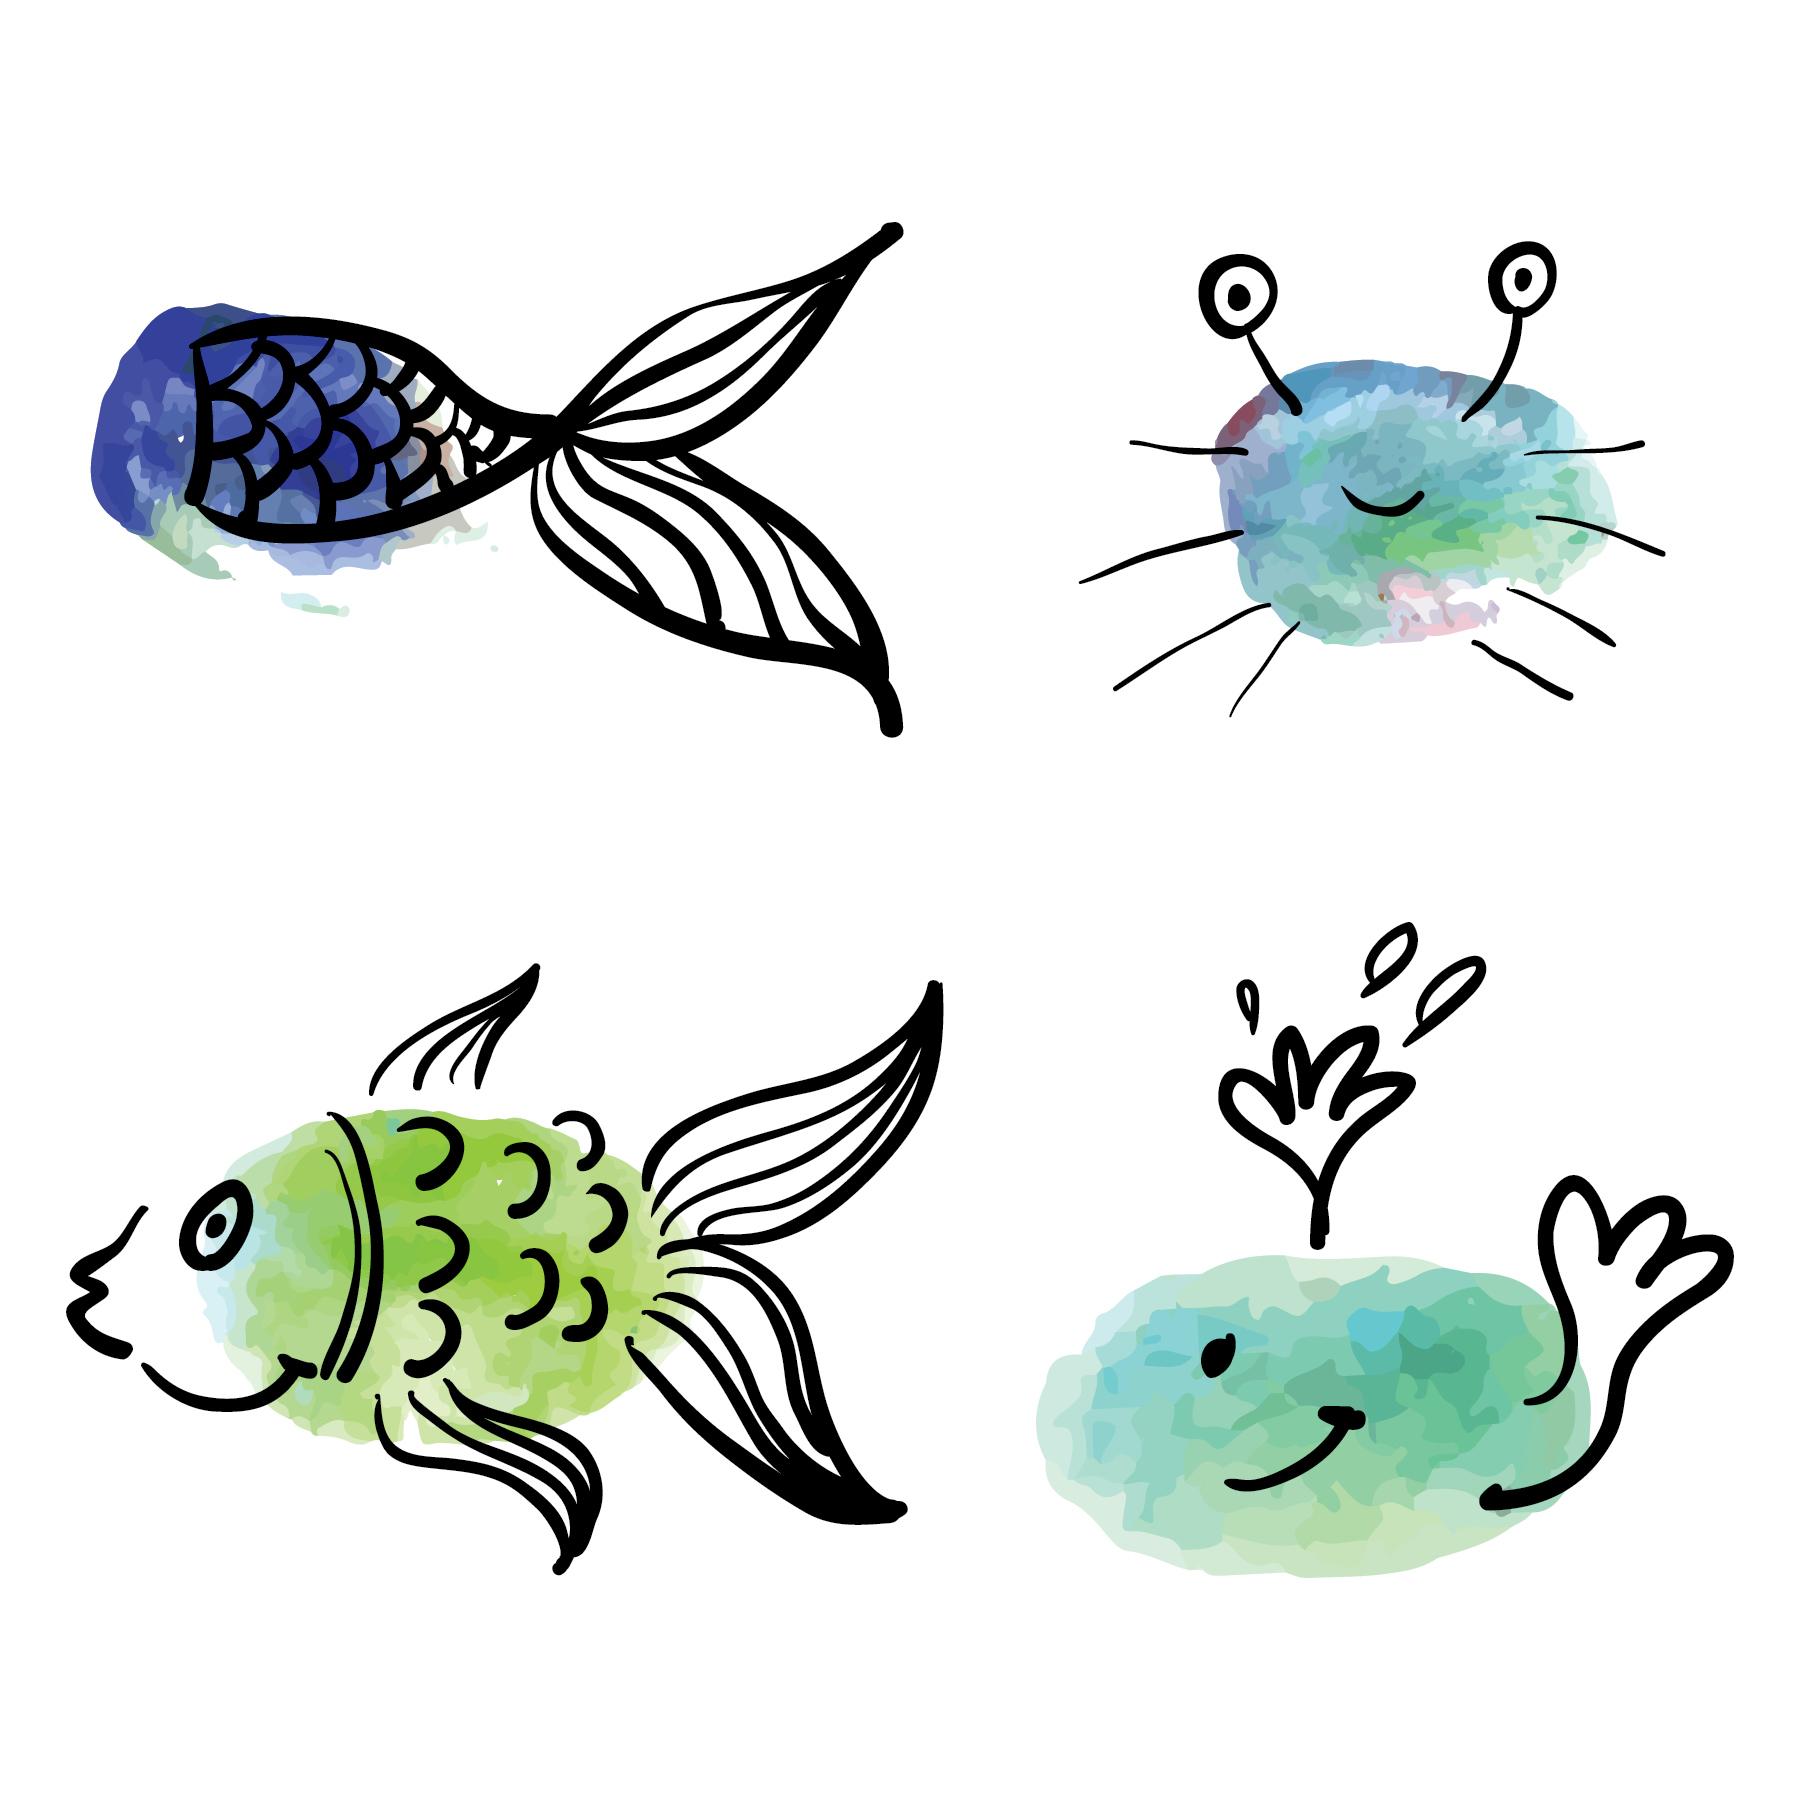 Kelp forest fingerprint sea animals examples